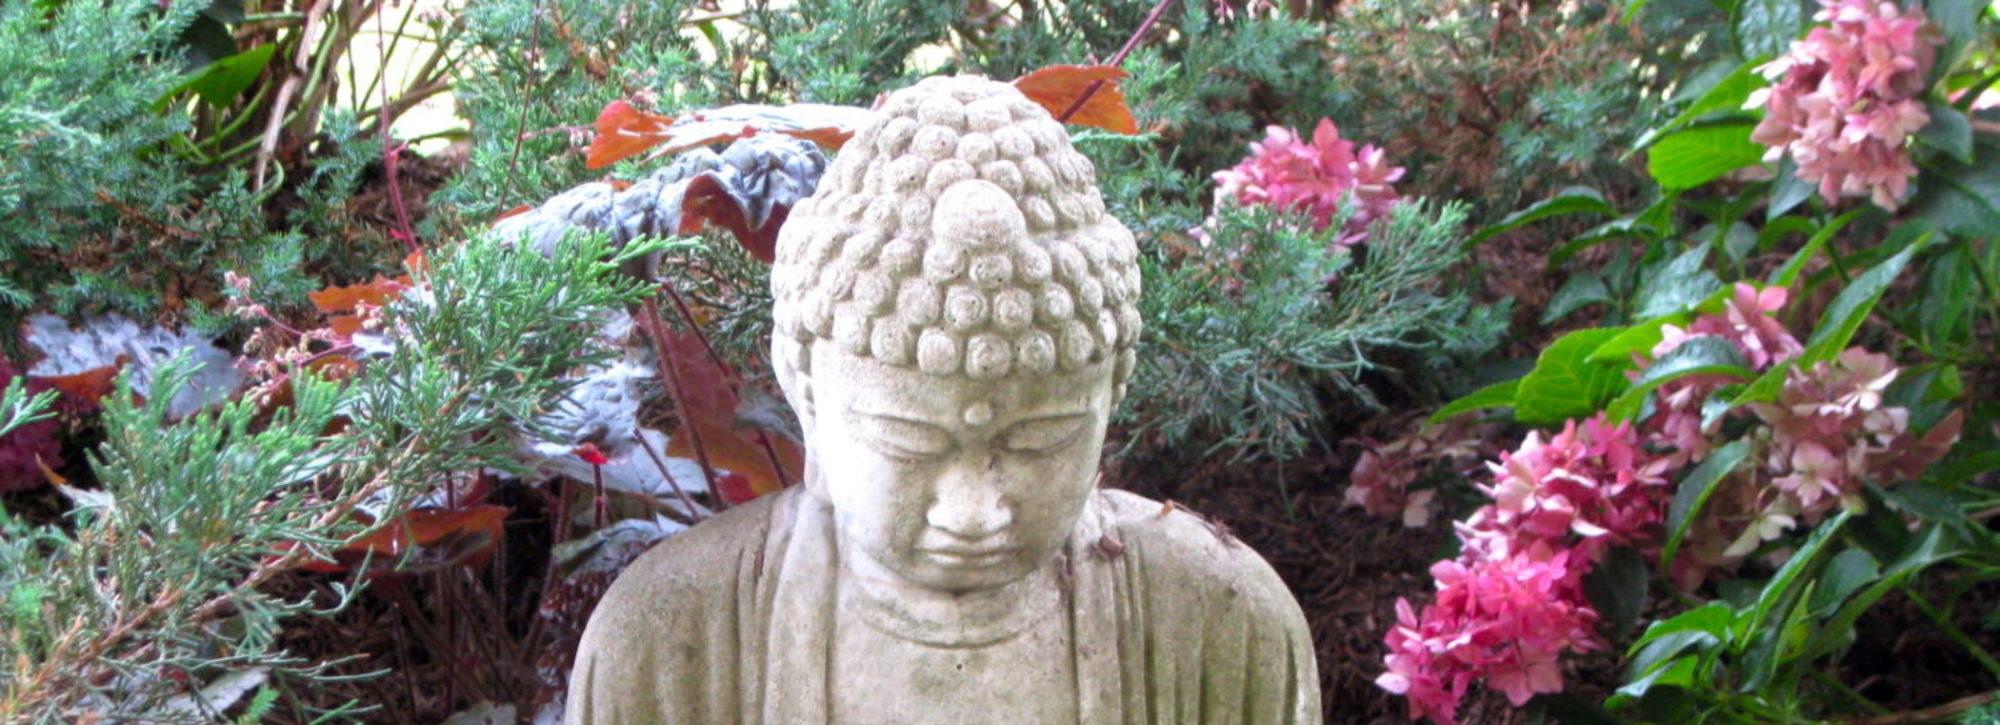 Jataka buddhism definition of sexual misconduct